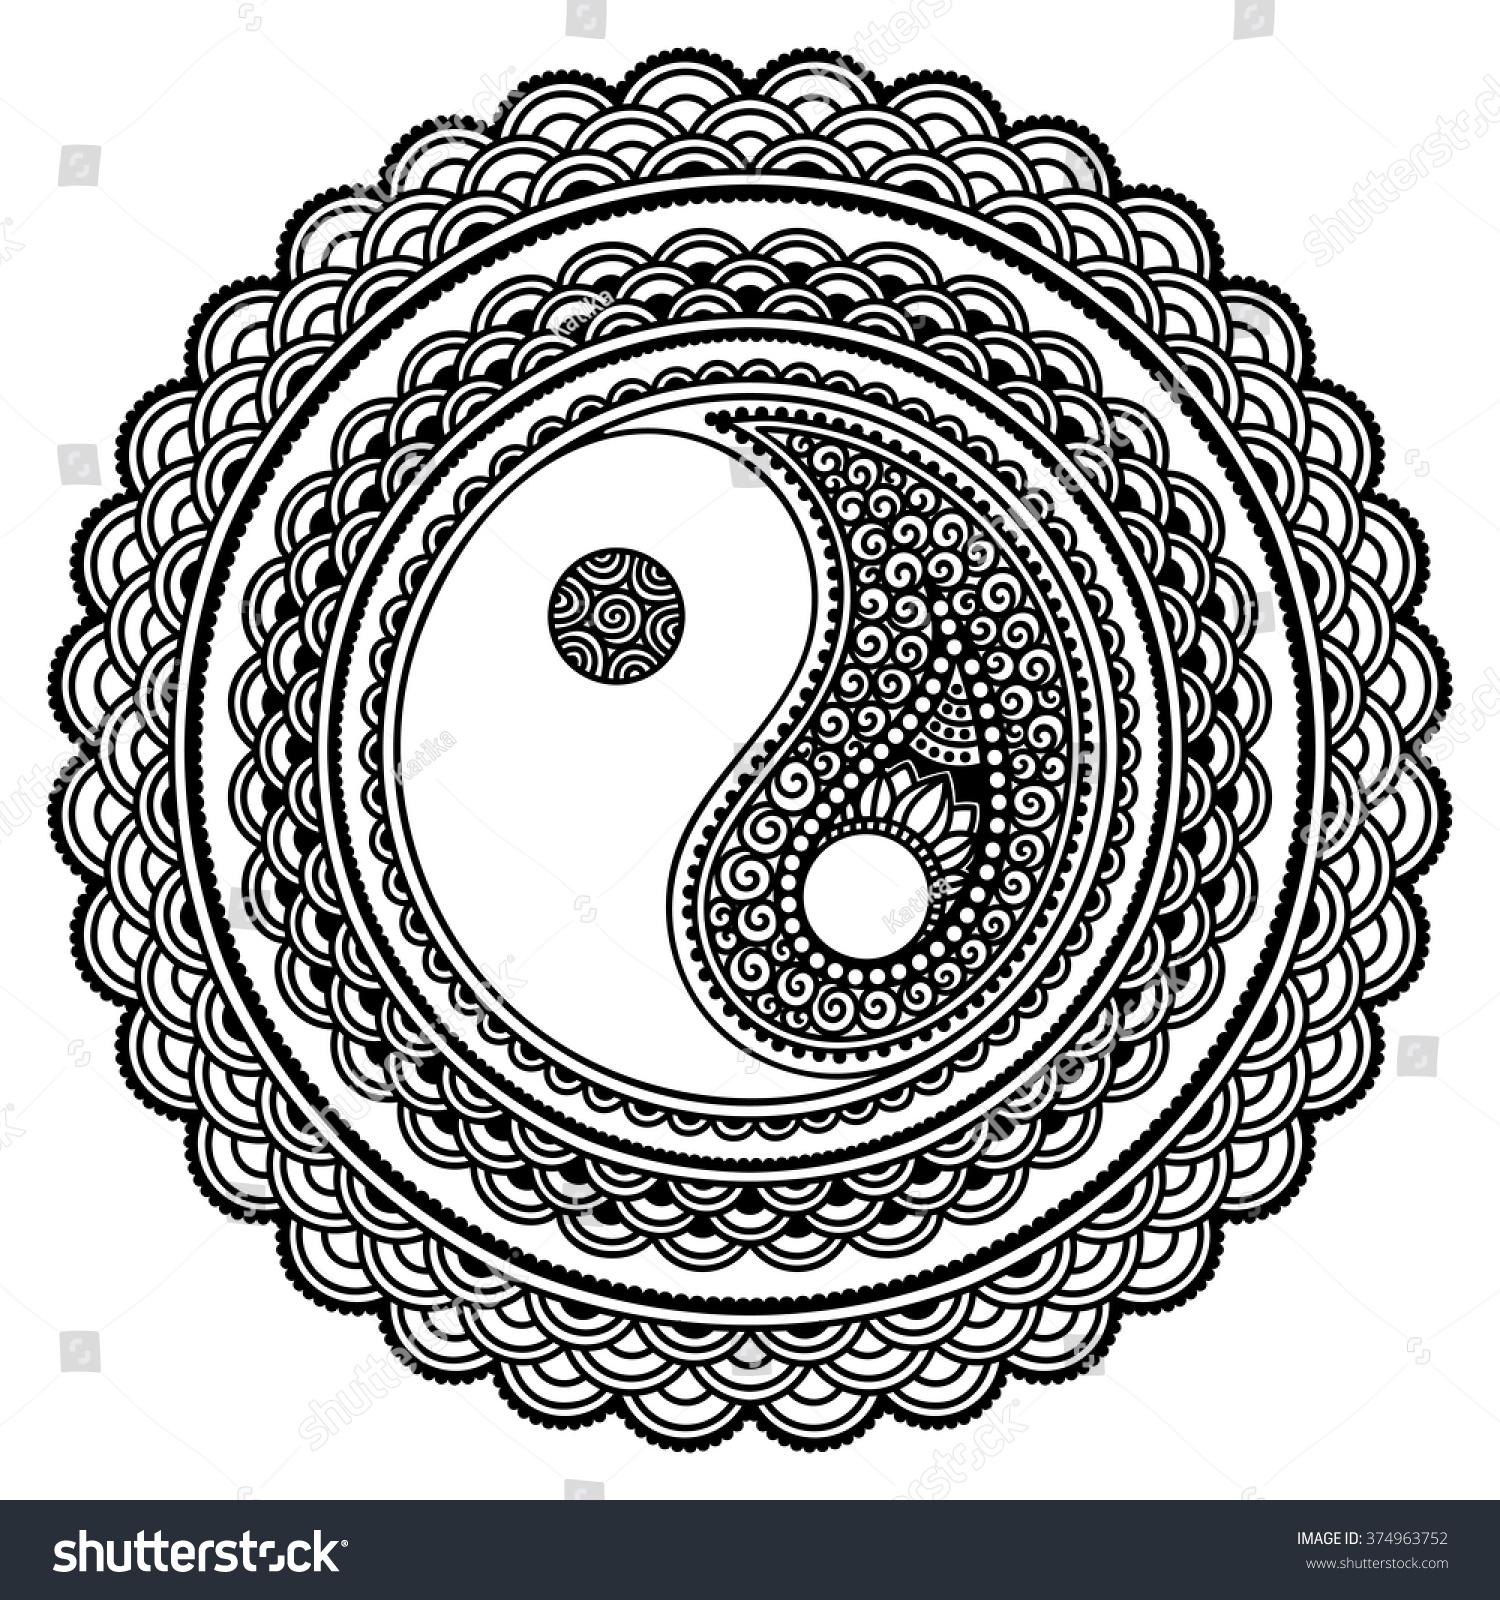 Coloring pages yin yang - Coloring Pages Yin Yang Yin Yang Decorative Symbol Mehndi Style